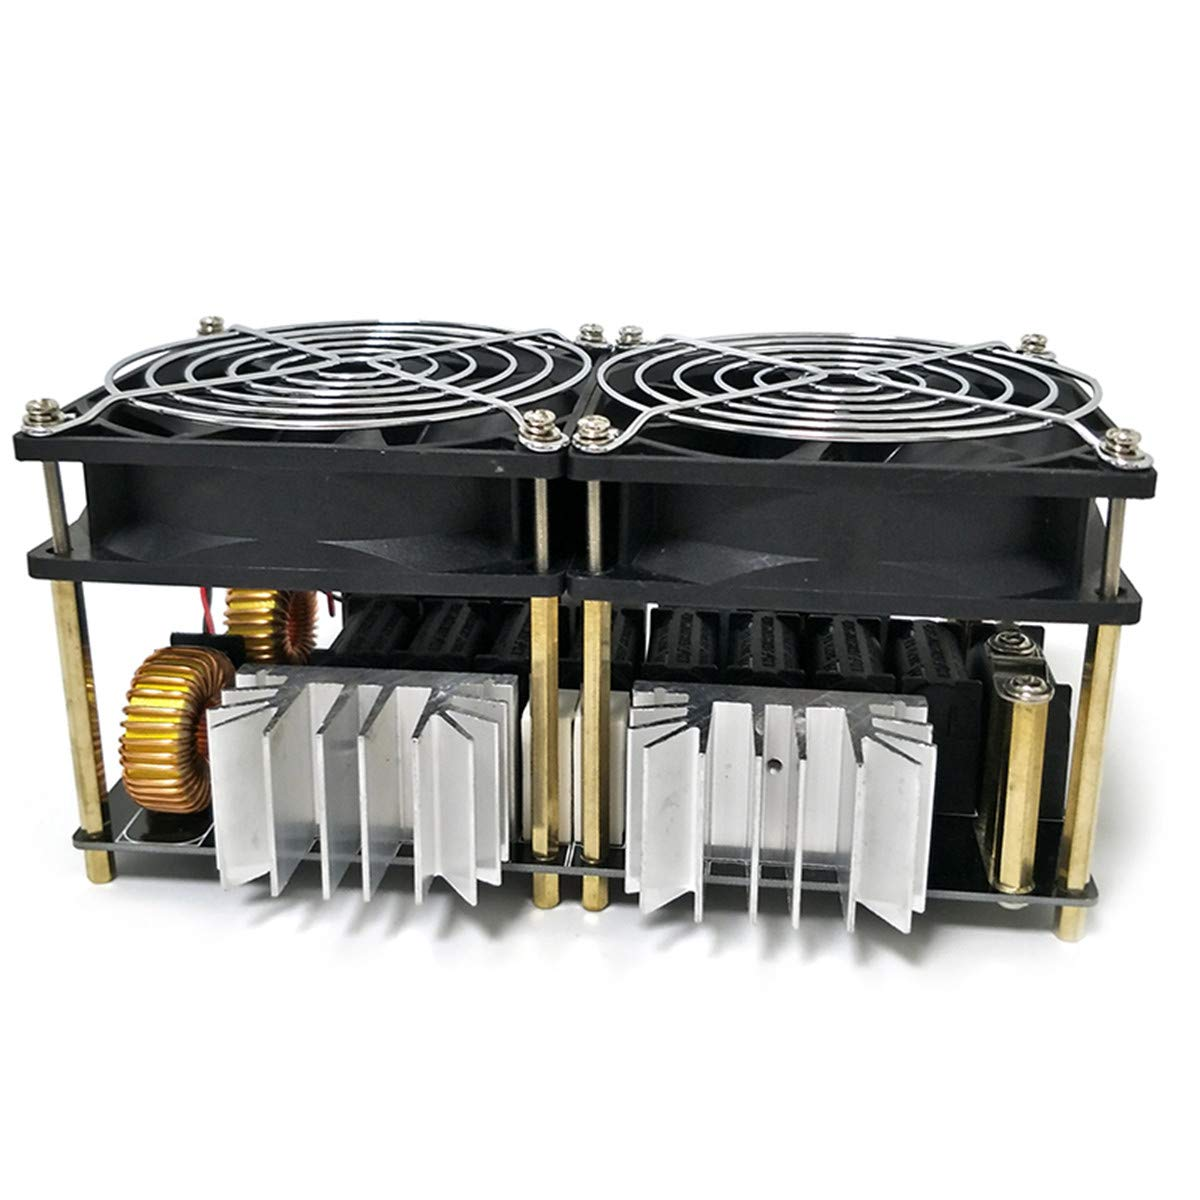 JOINVEN ZVS誘導加熱モジュール スーパーPCBのレイアウト設計 優れた放熱性 誘導加熱器高周波加熱装置溶融金属+コイルMayitr +埚埚+ポンプ 1800W B07G75C3JB